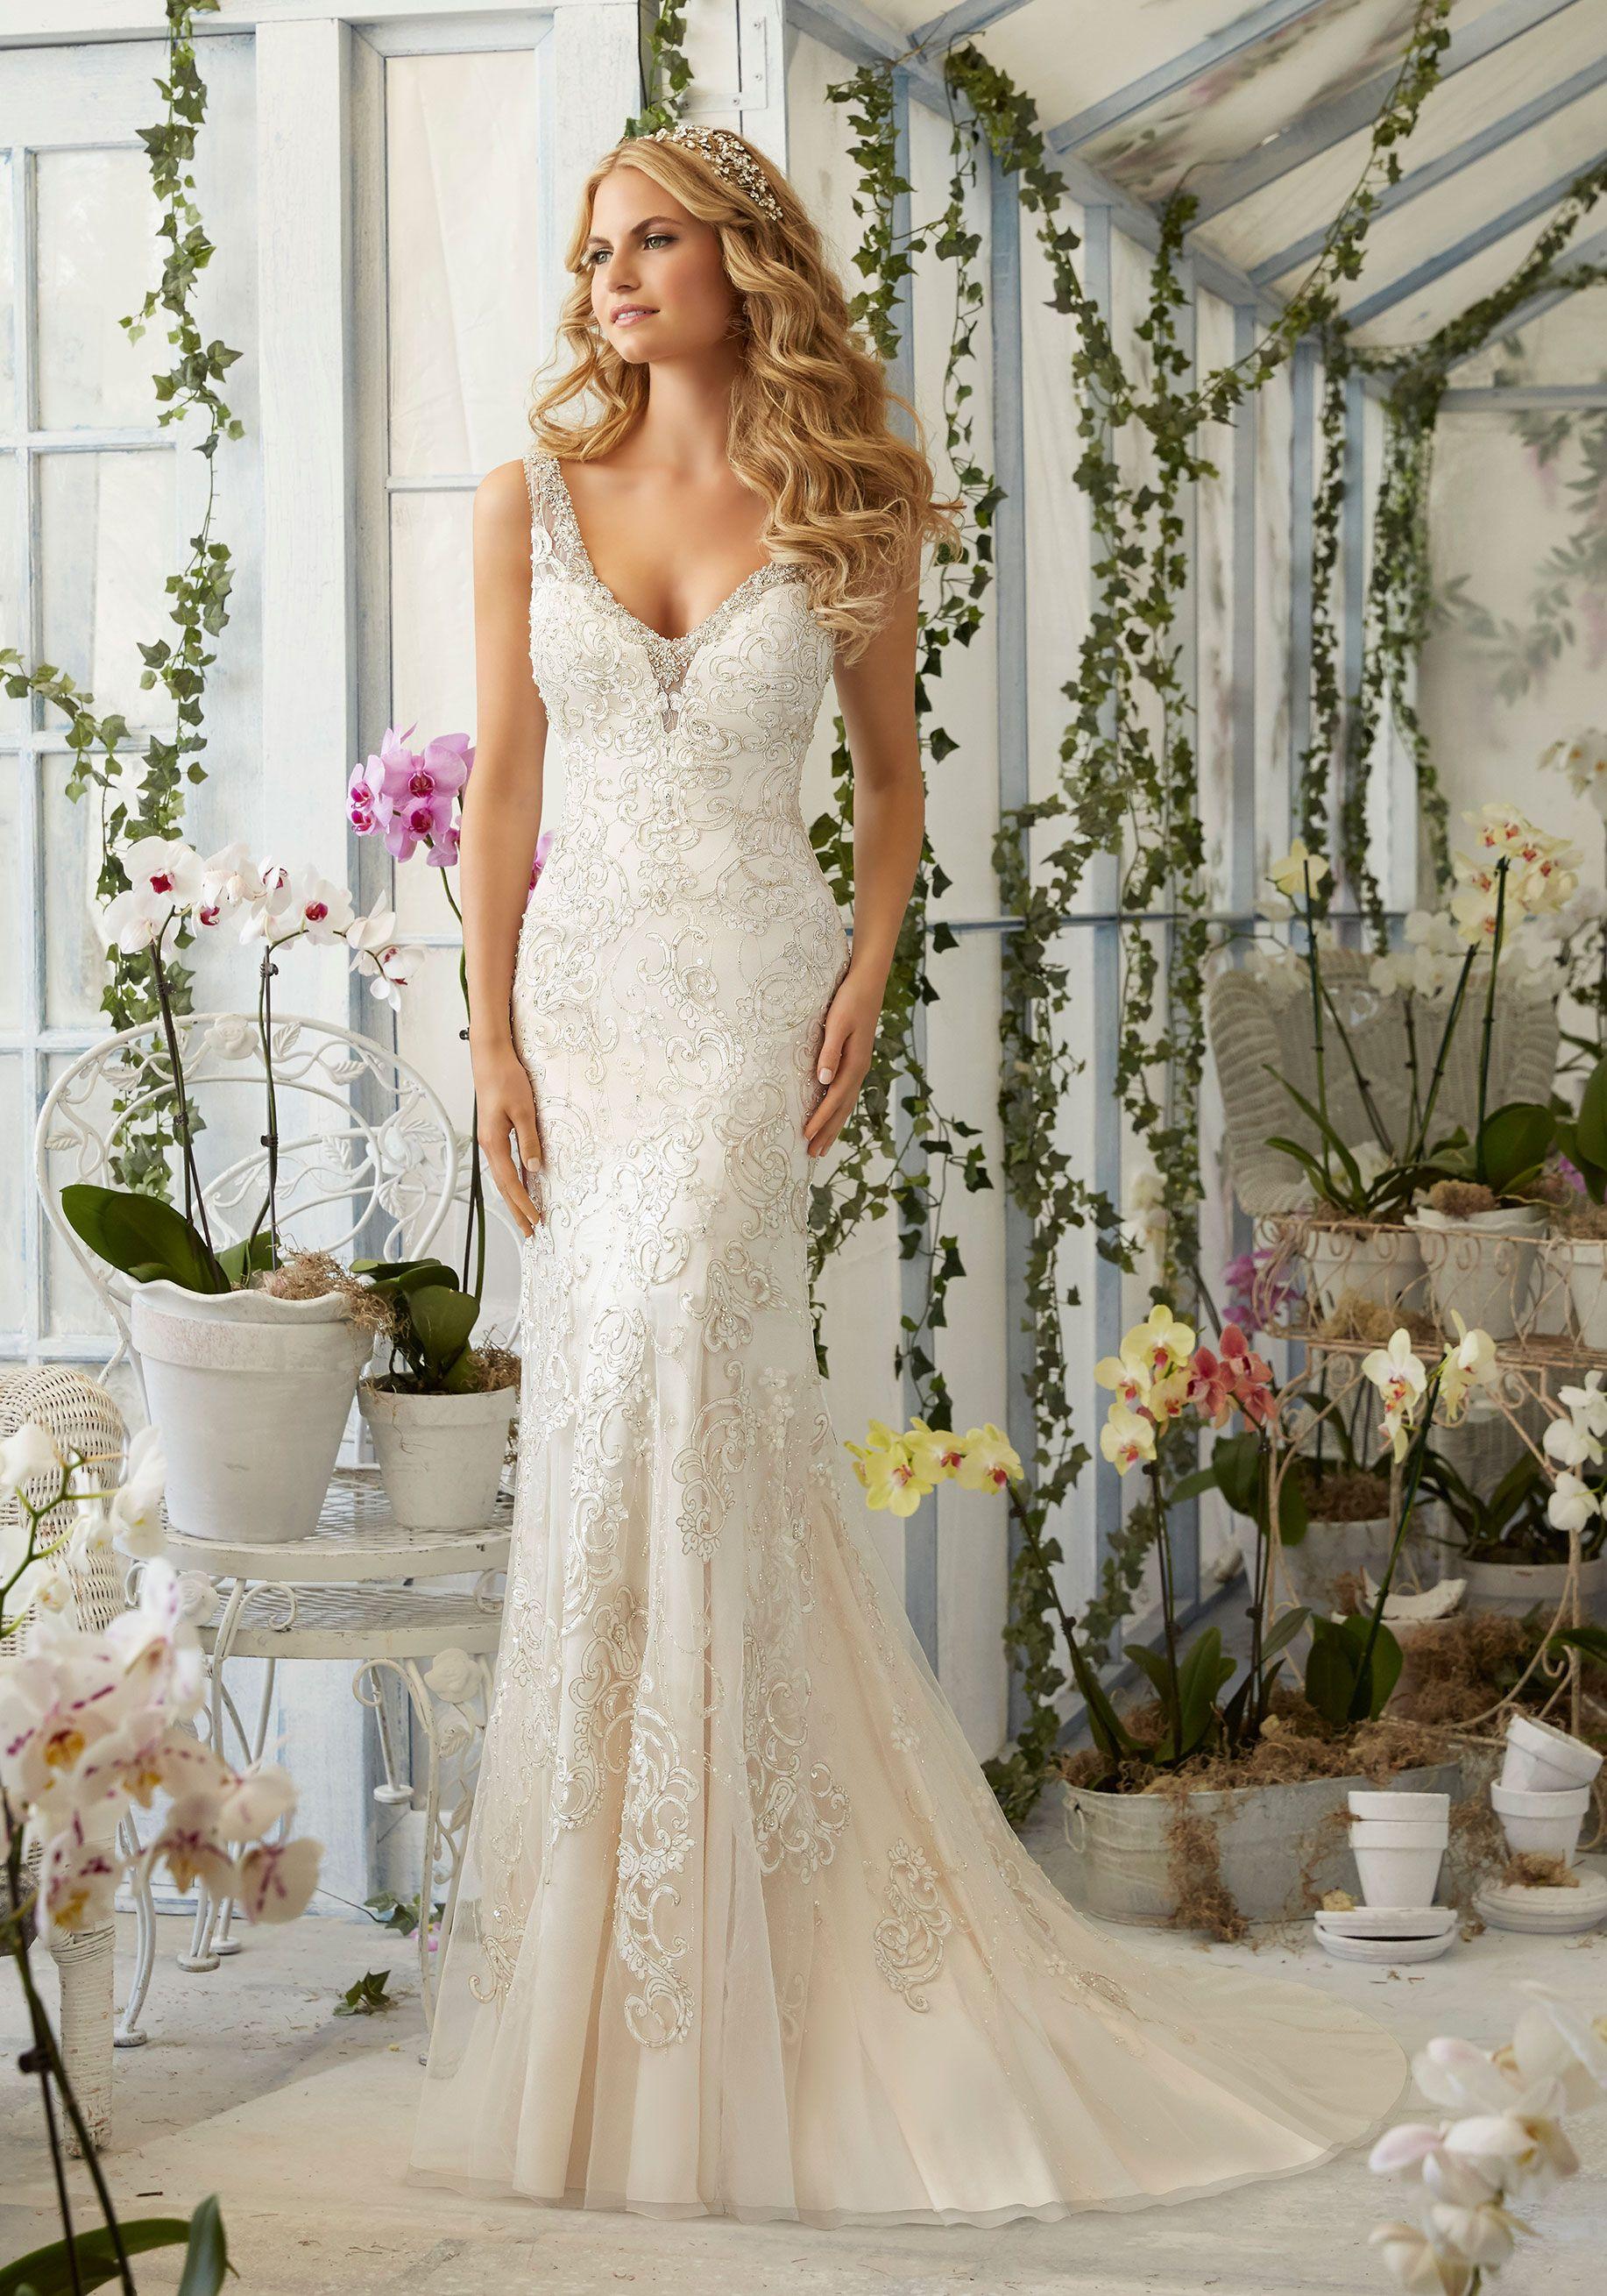 Disenadores vestidos de novia costa rica